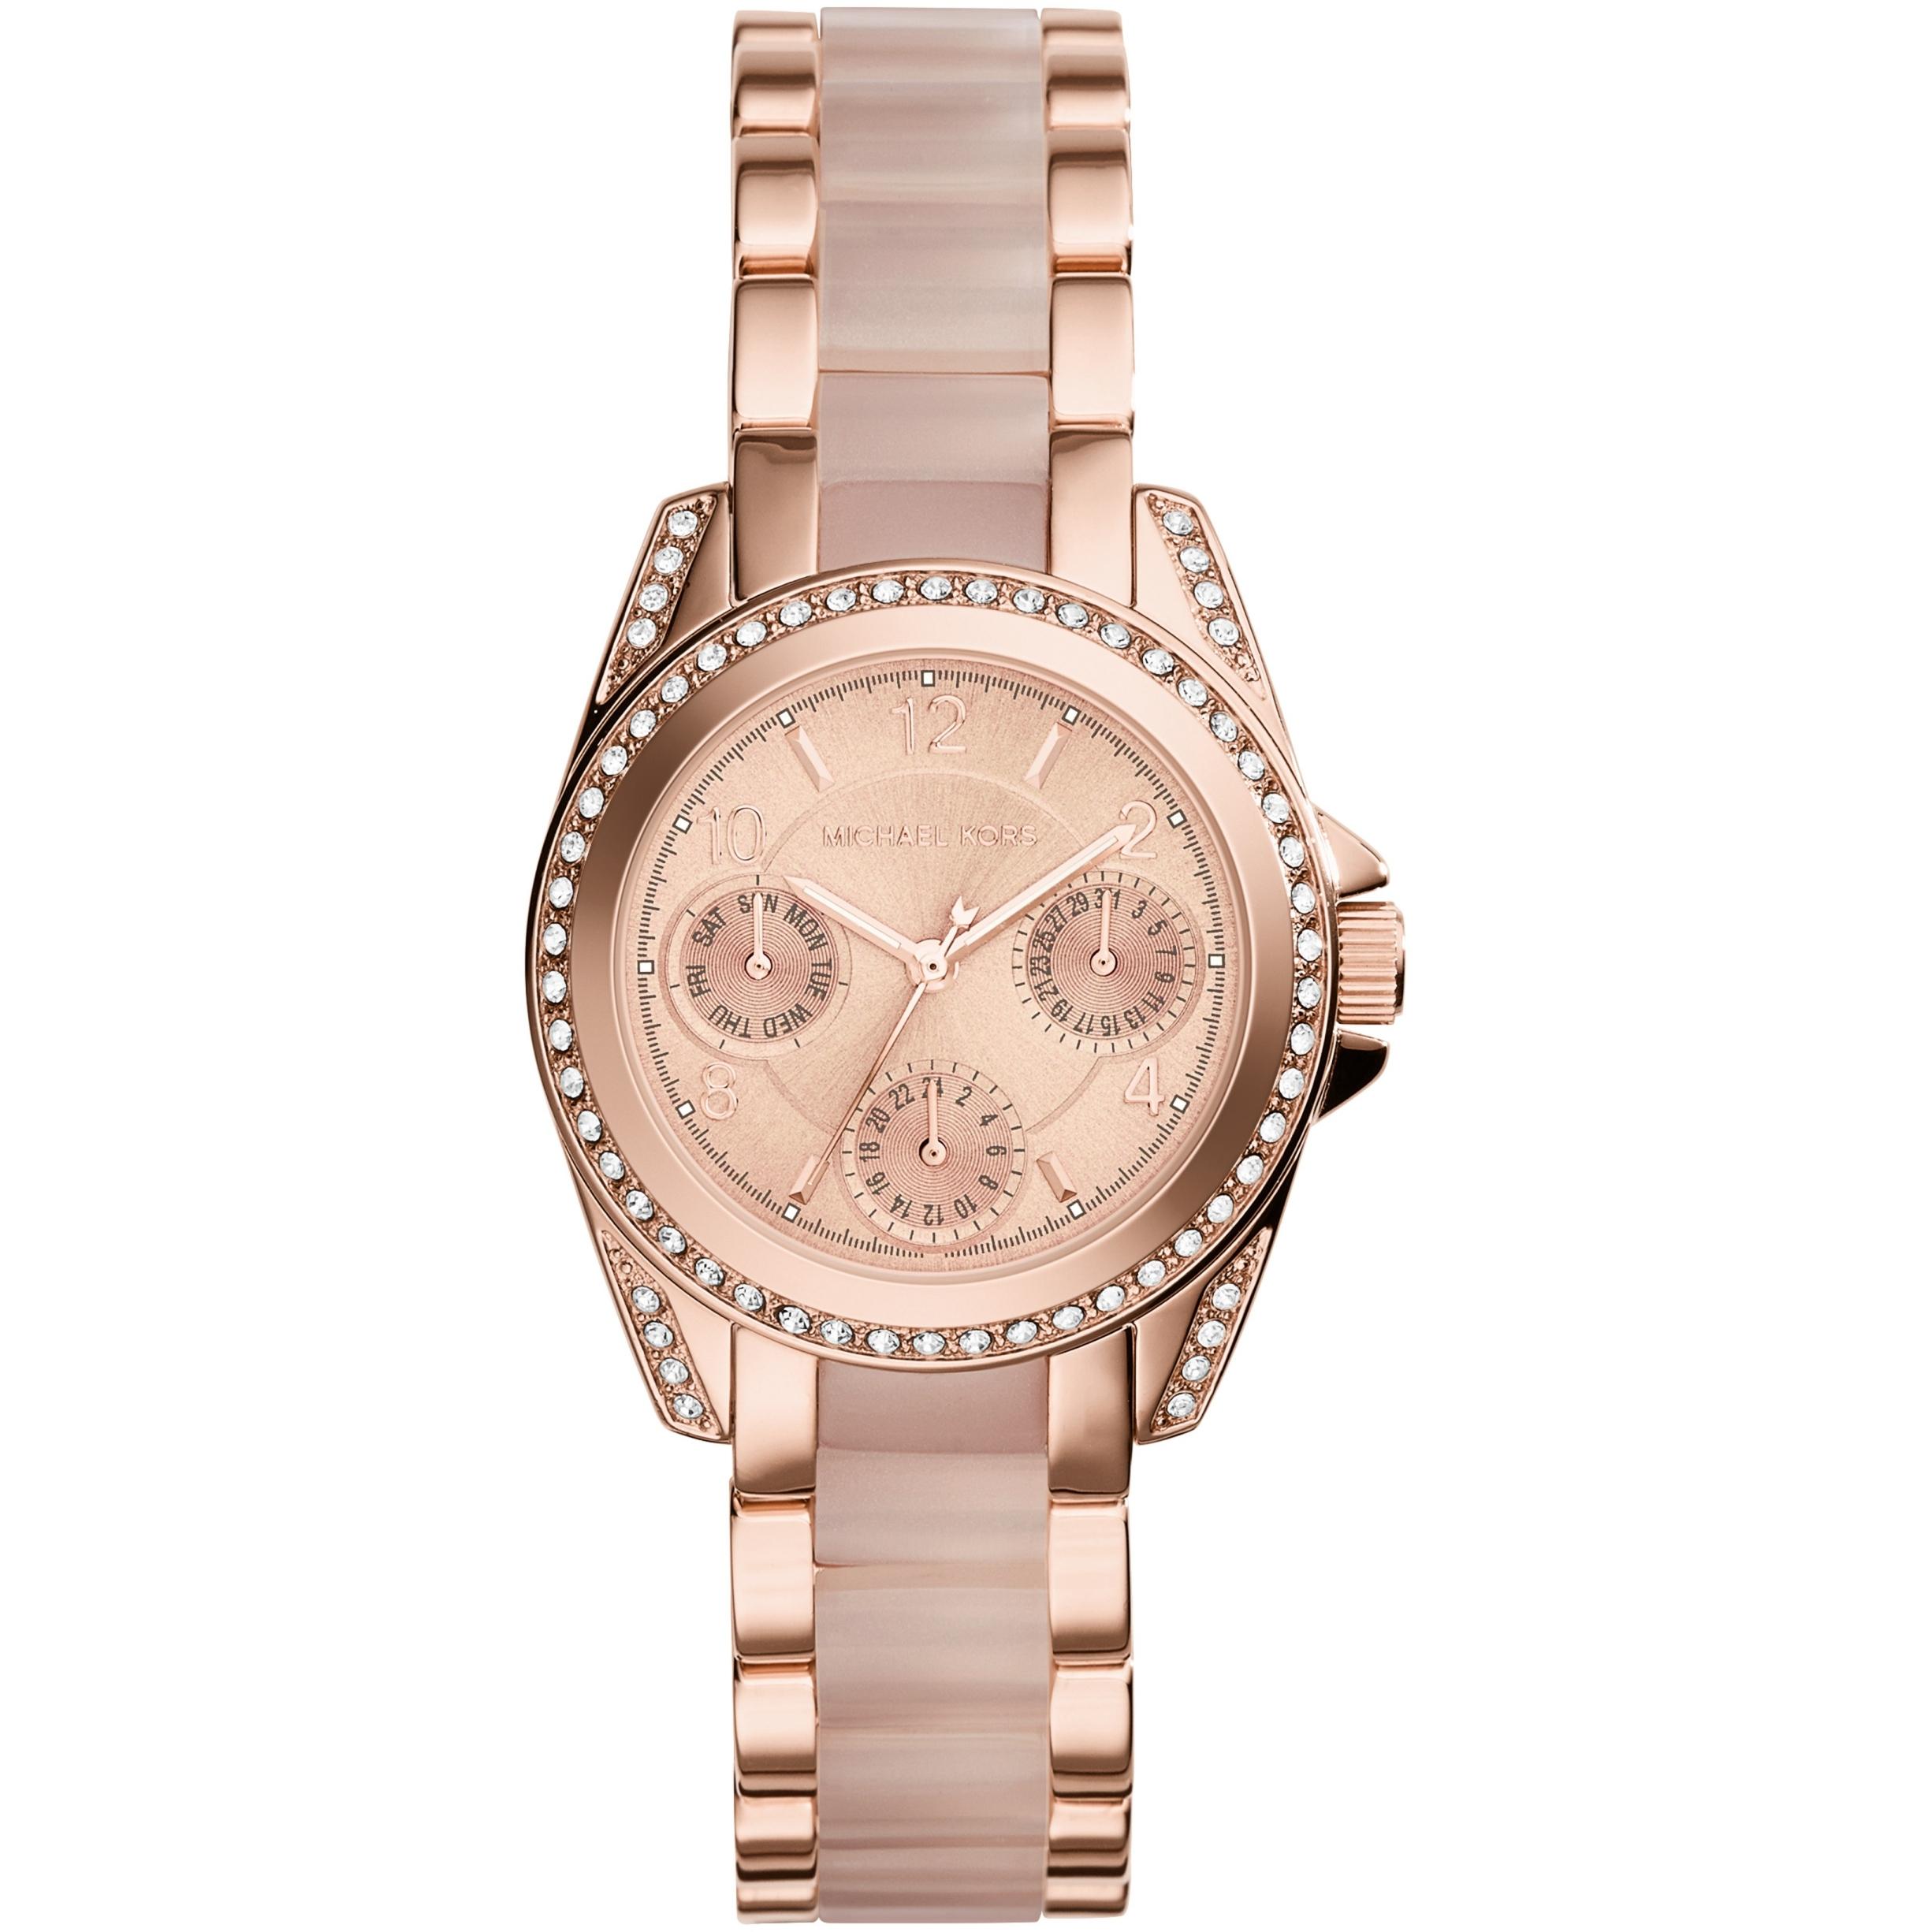 4108c4bbbfab Ladies Michael Kors Mini Blair Watch (MK6175)   WatchShop.com™